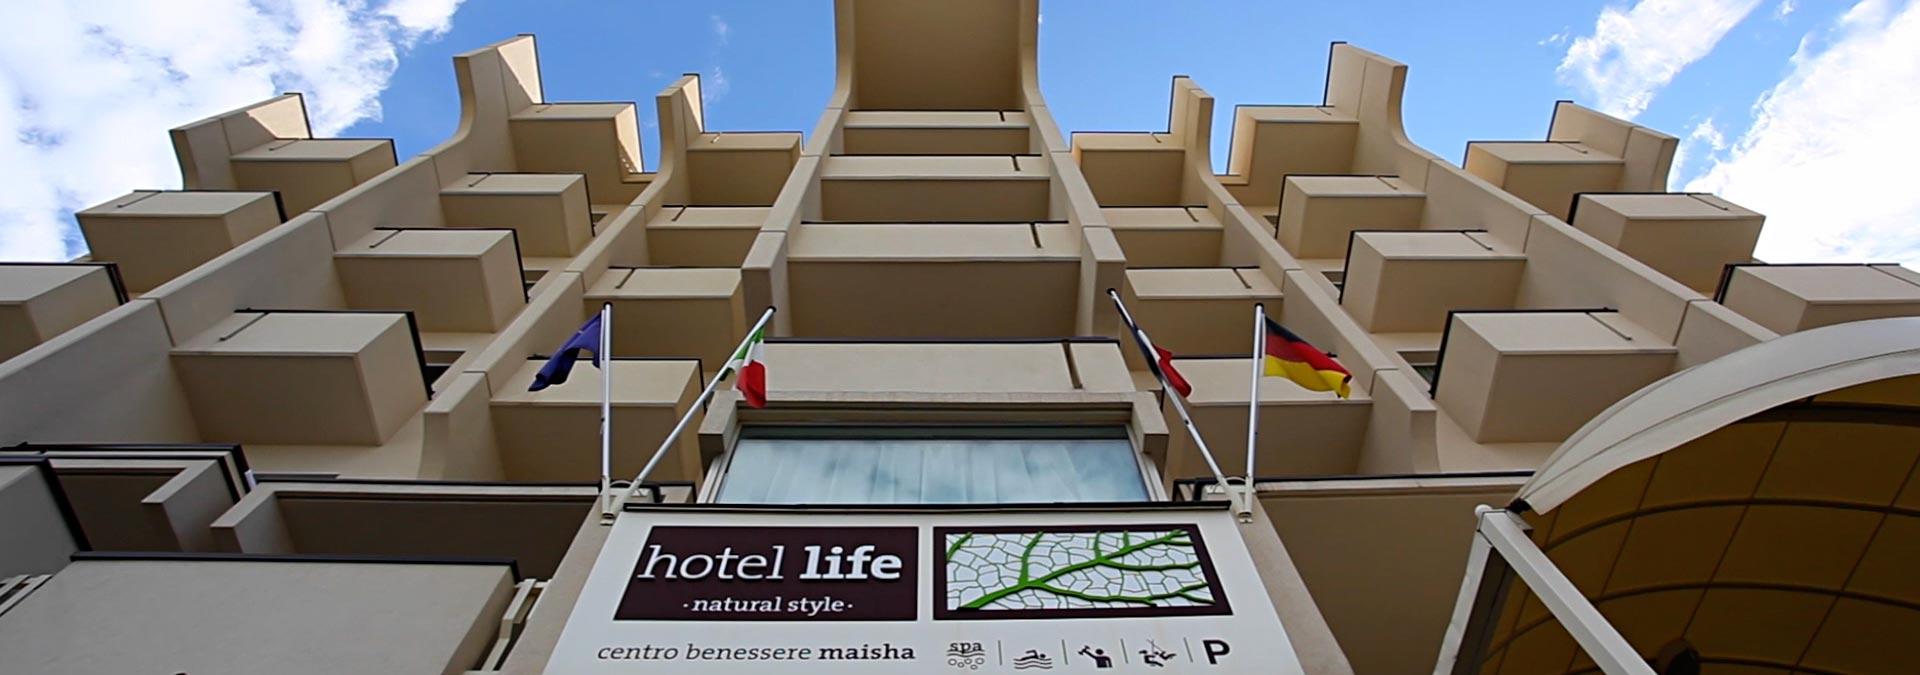 Hotel Life Rimini